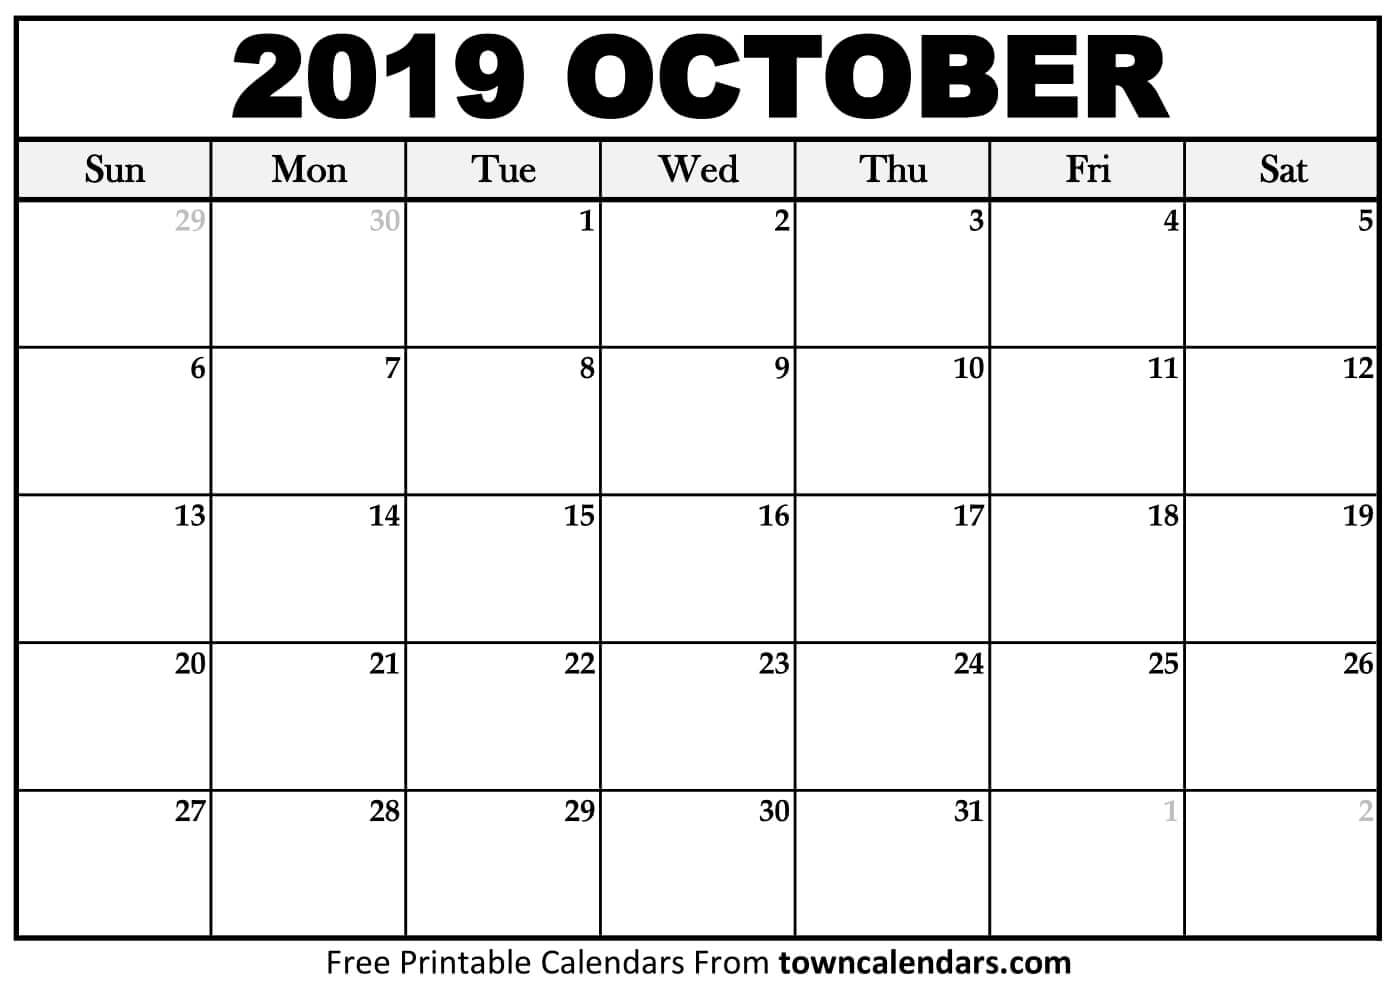 Free Printable Calendar Beaucal | Month Calendar Printable